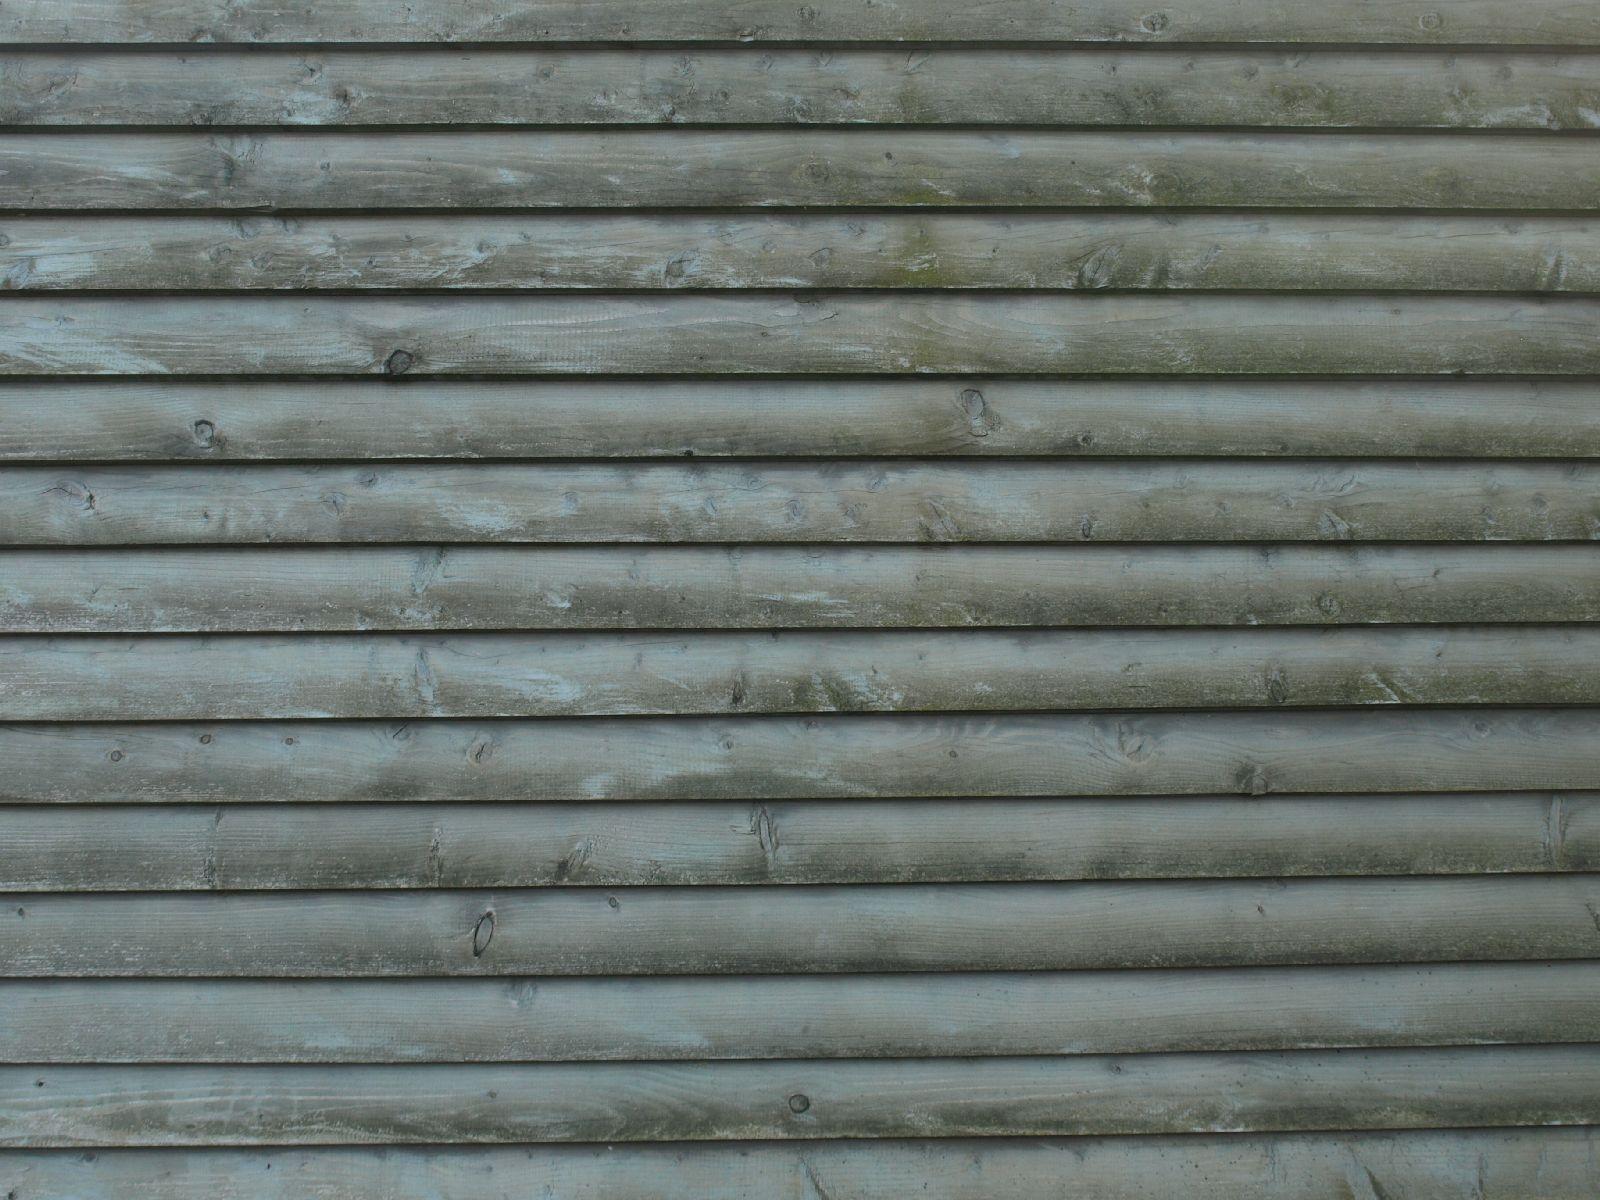 Wood_Texture_A_P9209739